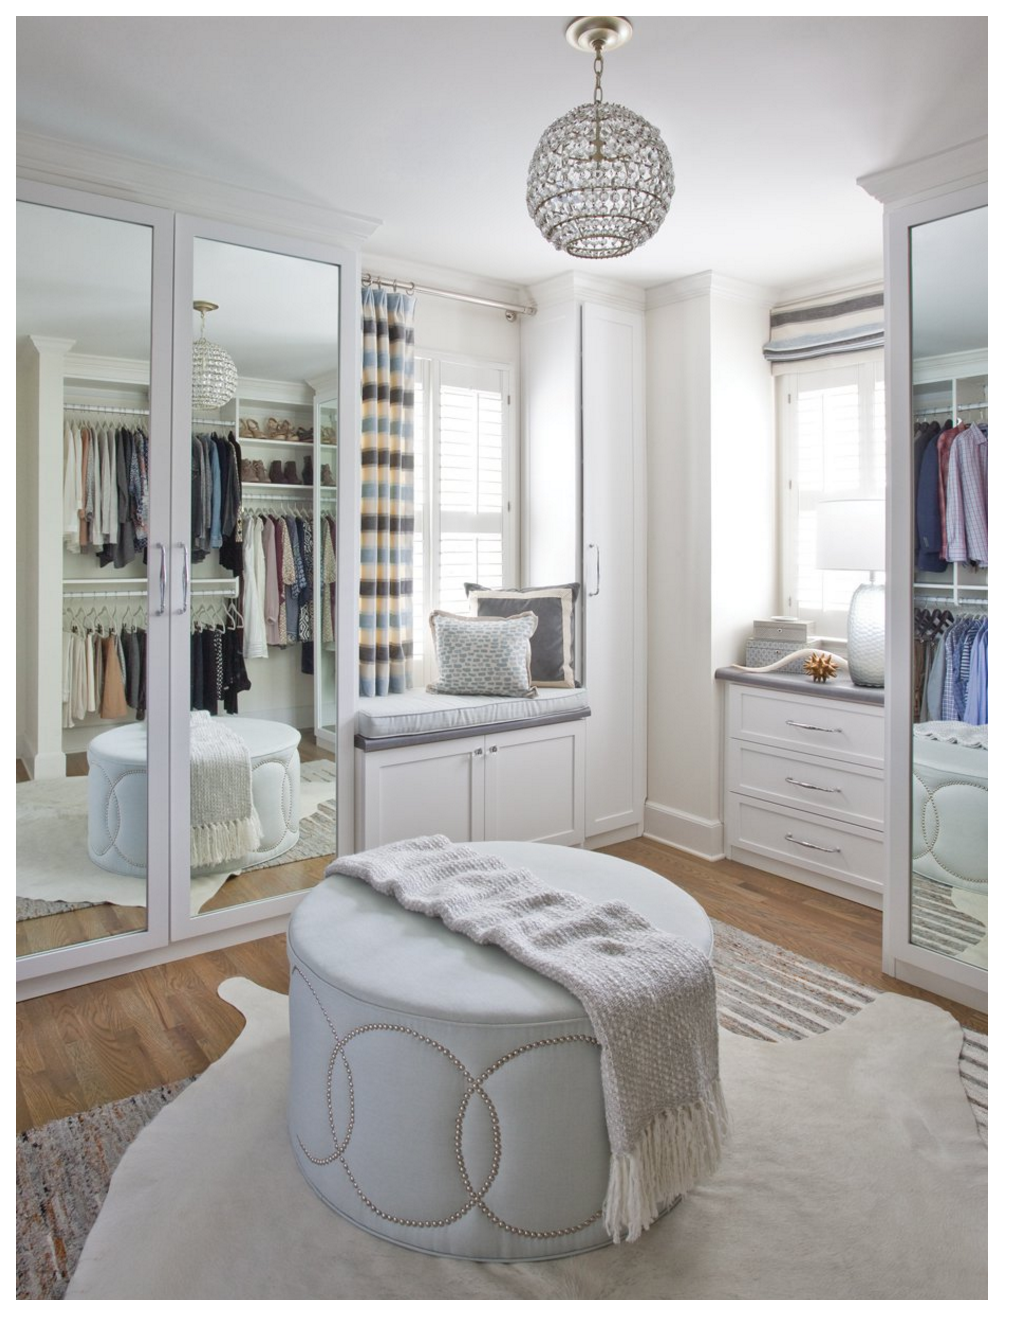 Room Envy | Editor: Lisa Mowry | Photographer: Christina Wedge